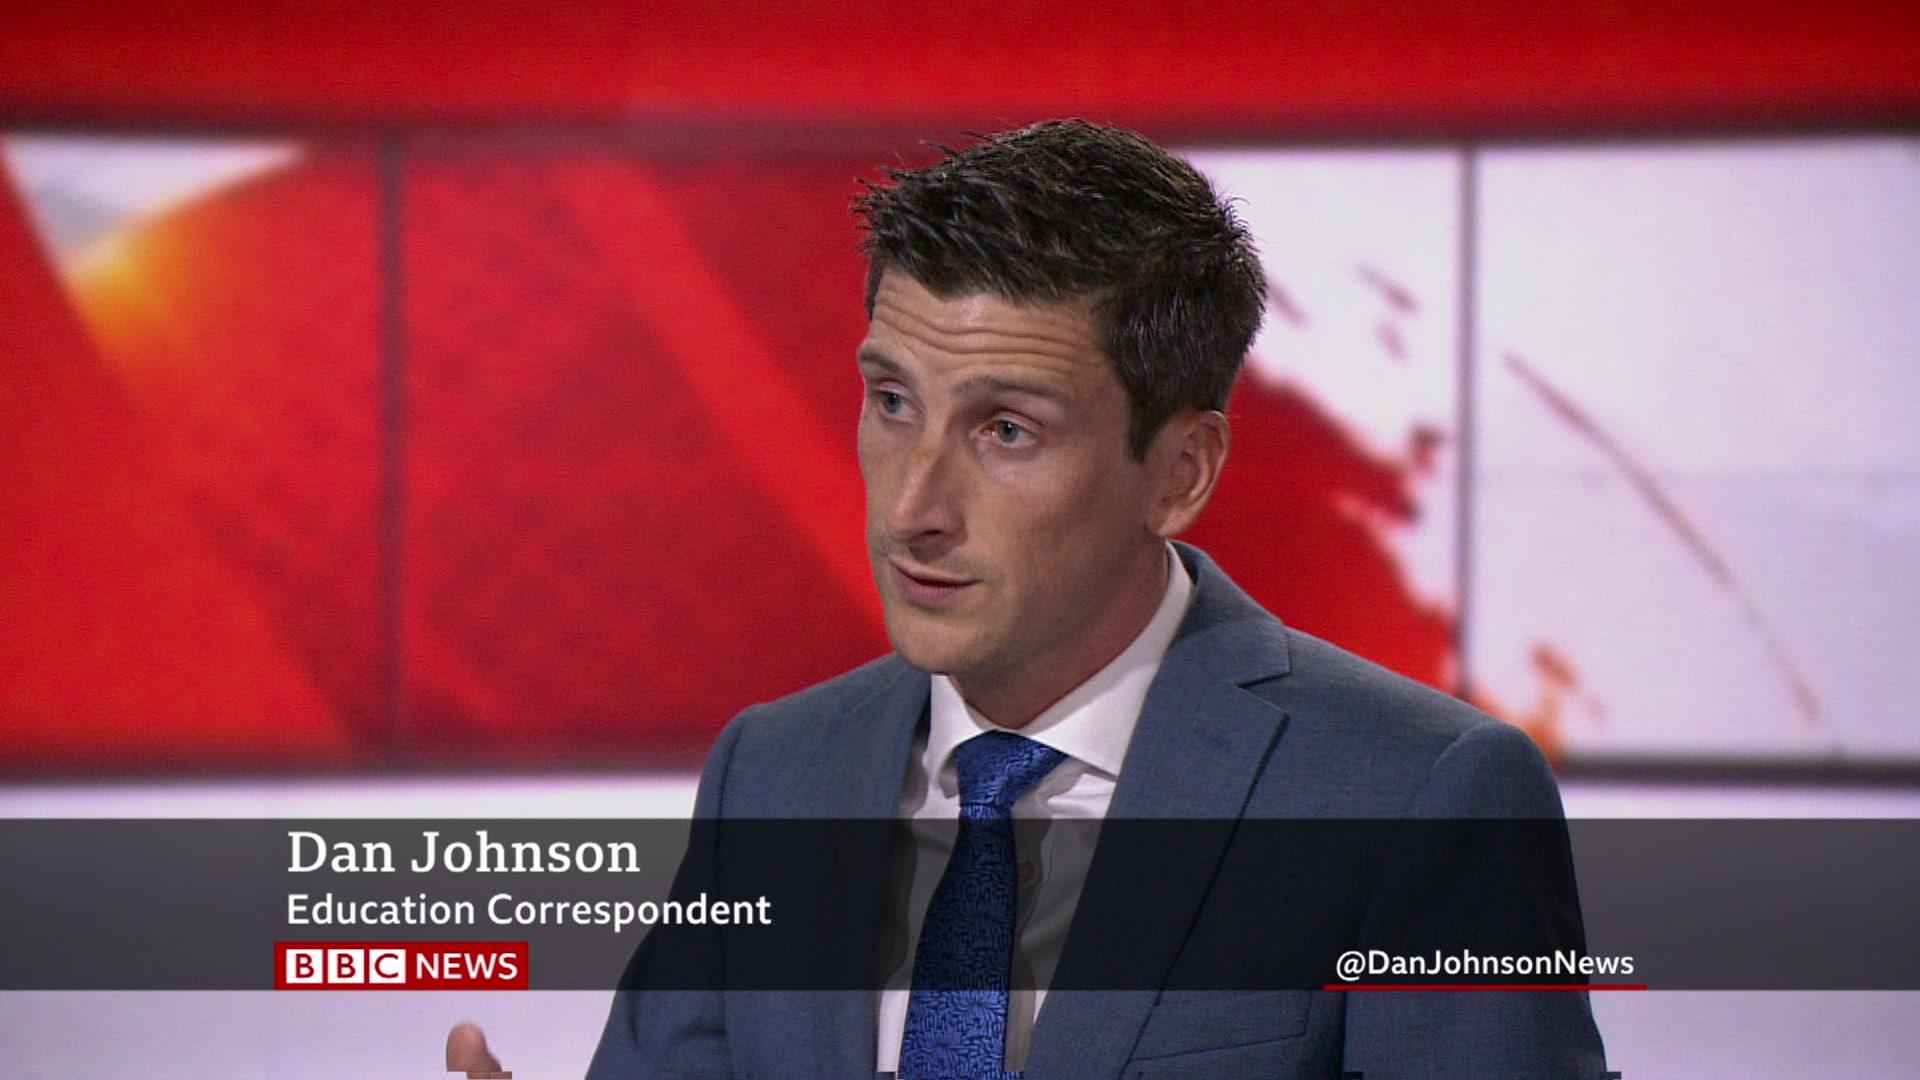 Dan Johnson moves to education